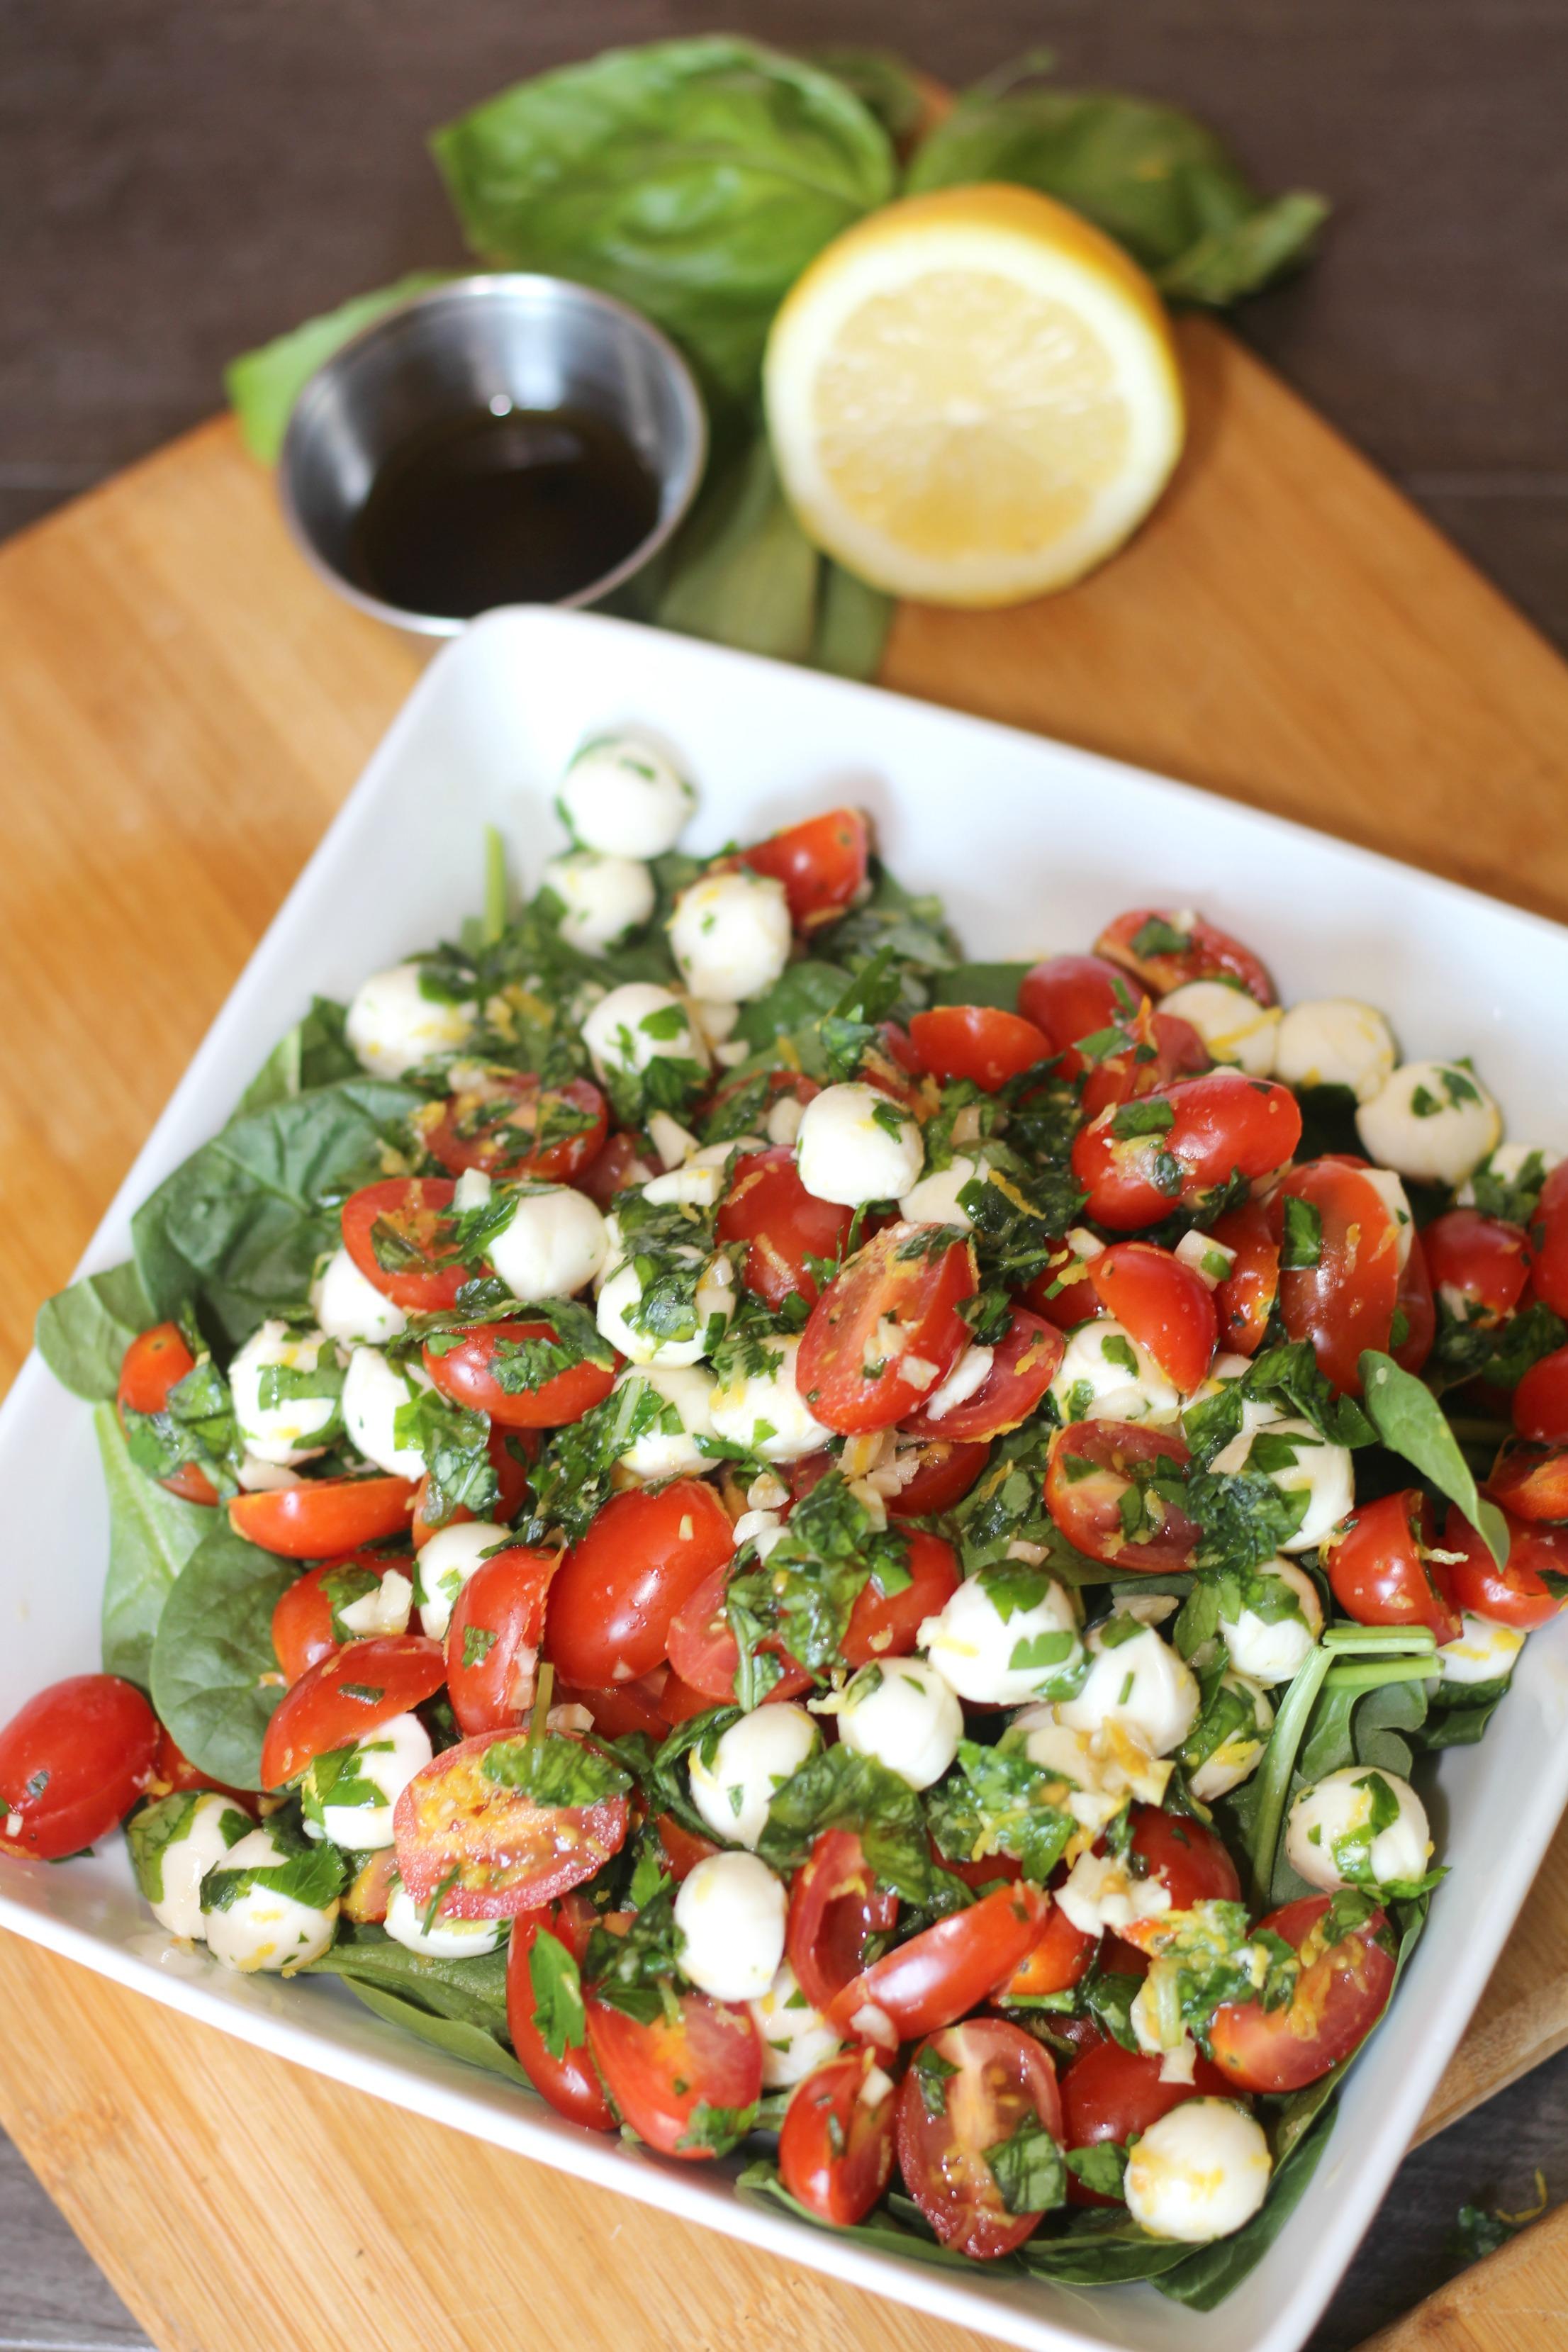 Easy Weeknight Dinner - Pizza & Caprese Salad